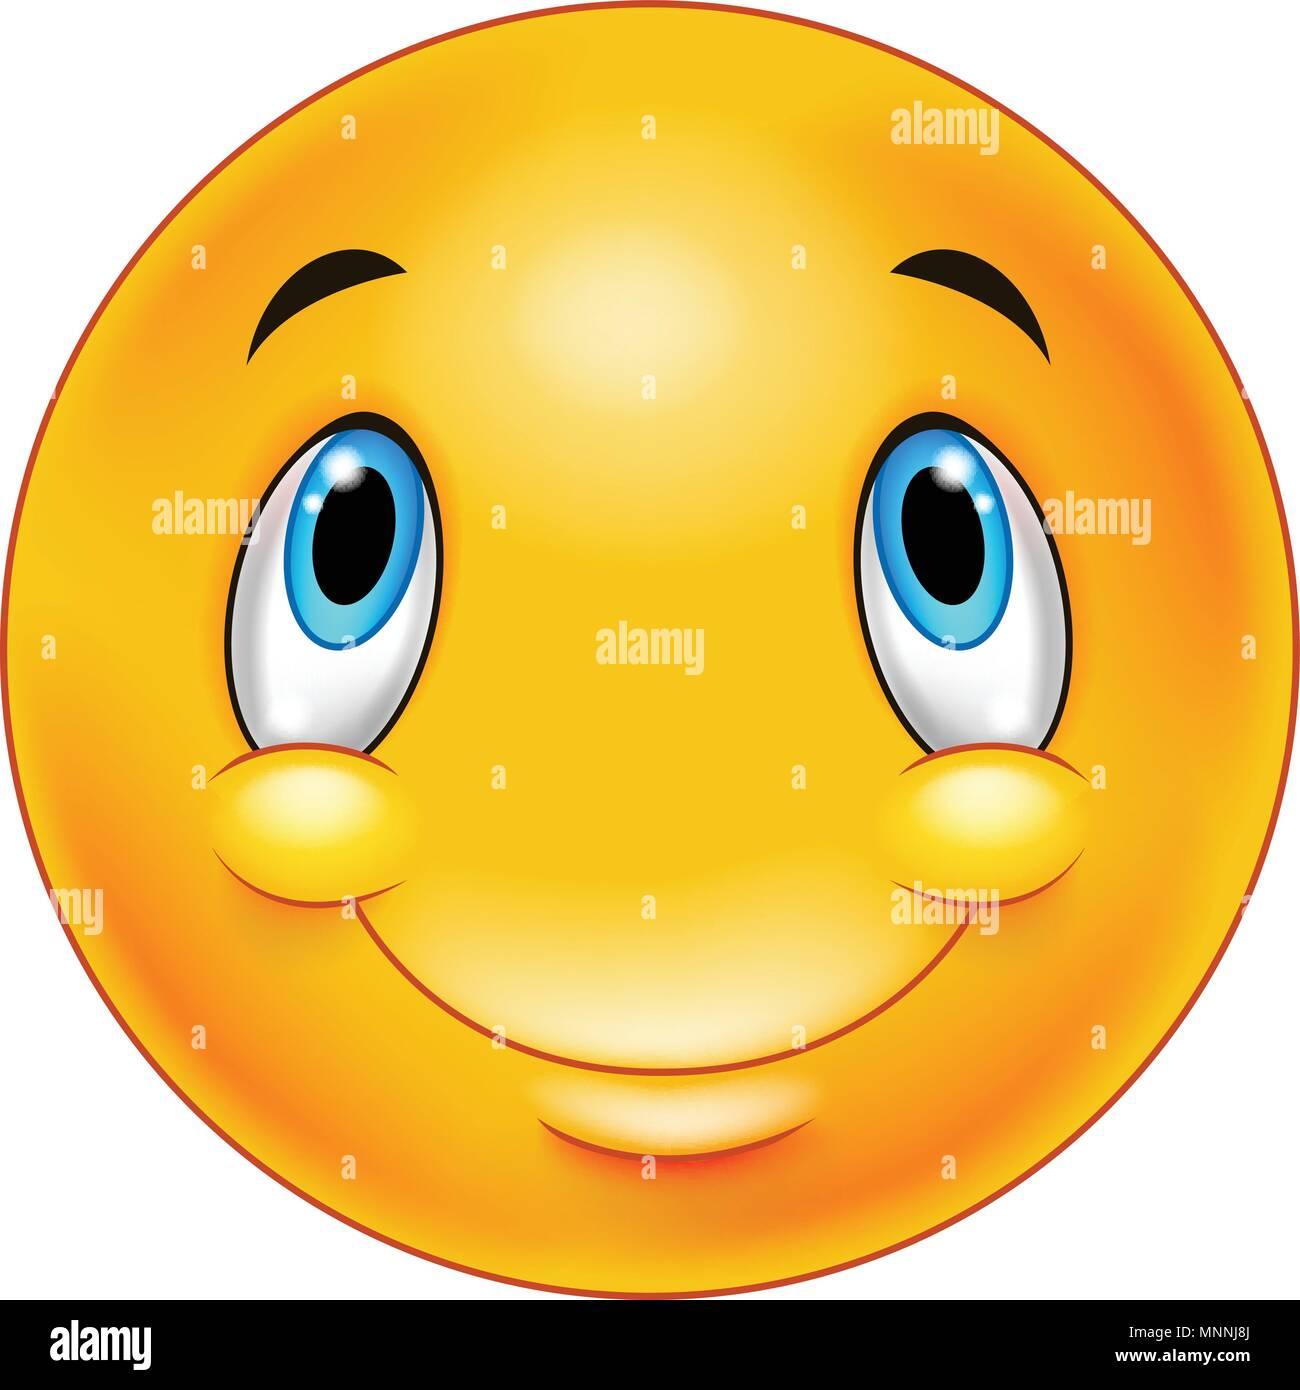 Thinking emoticon smiley - Stock Vector